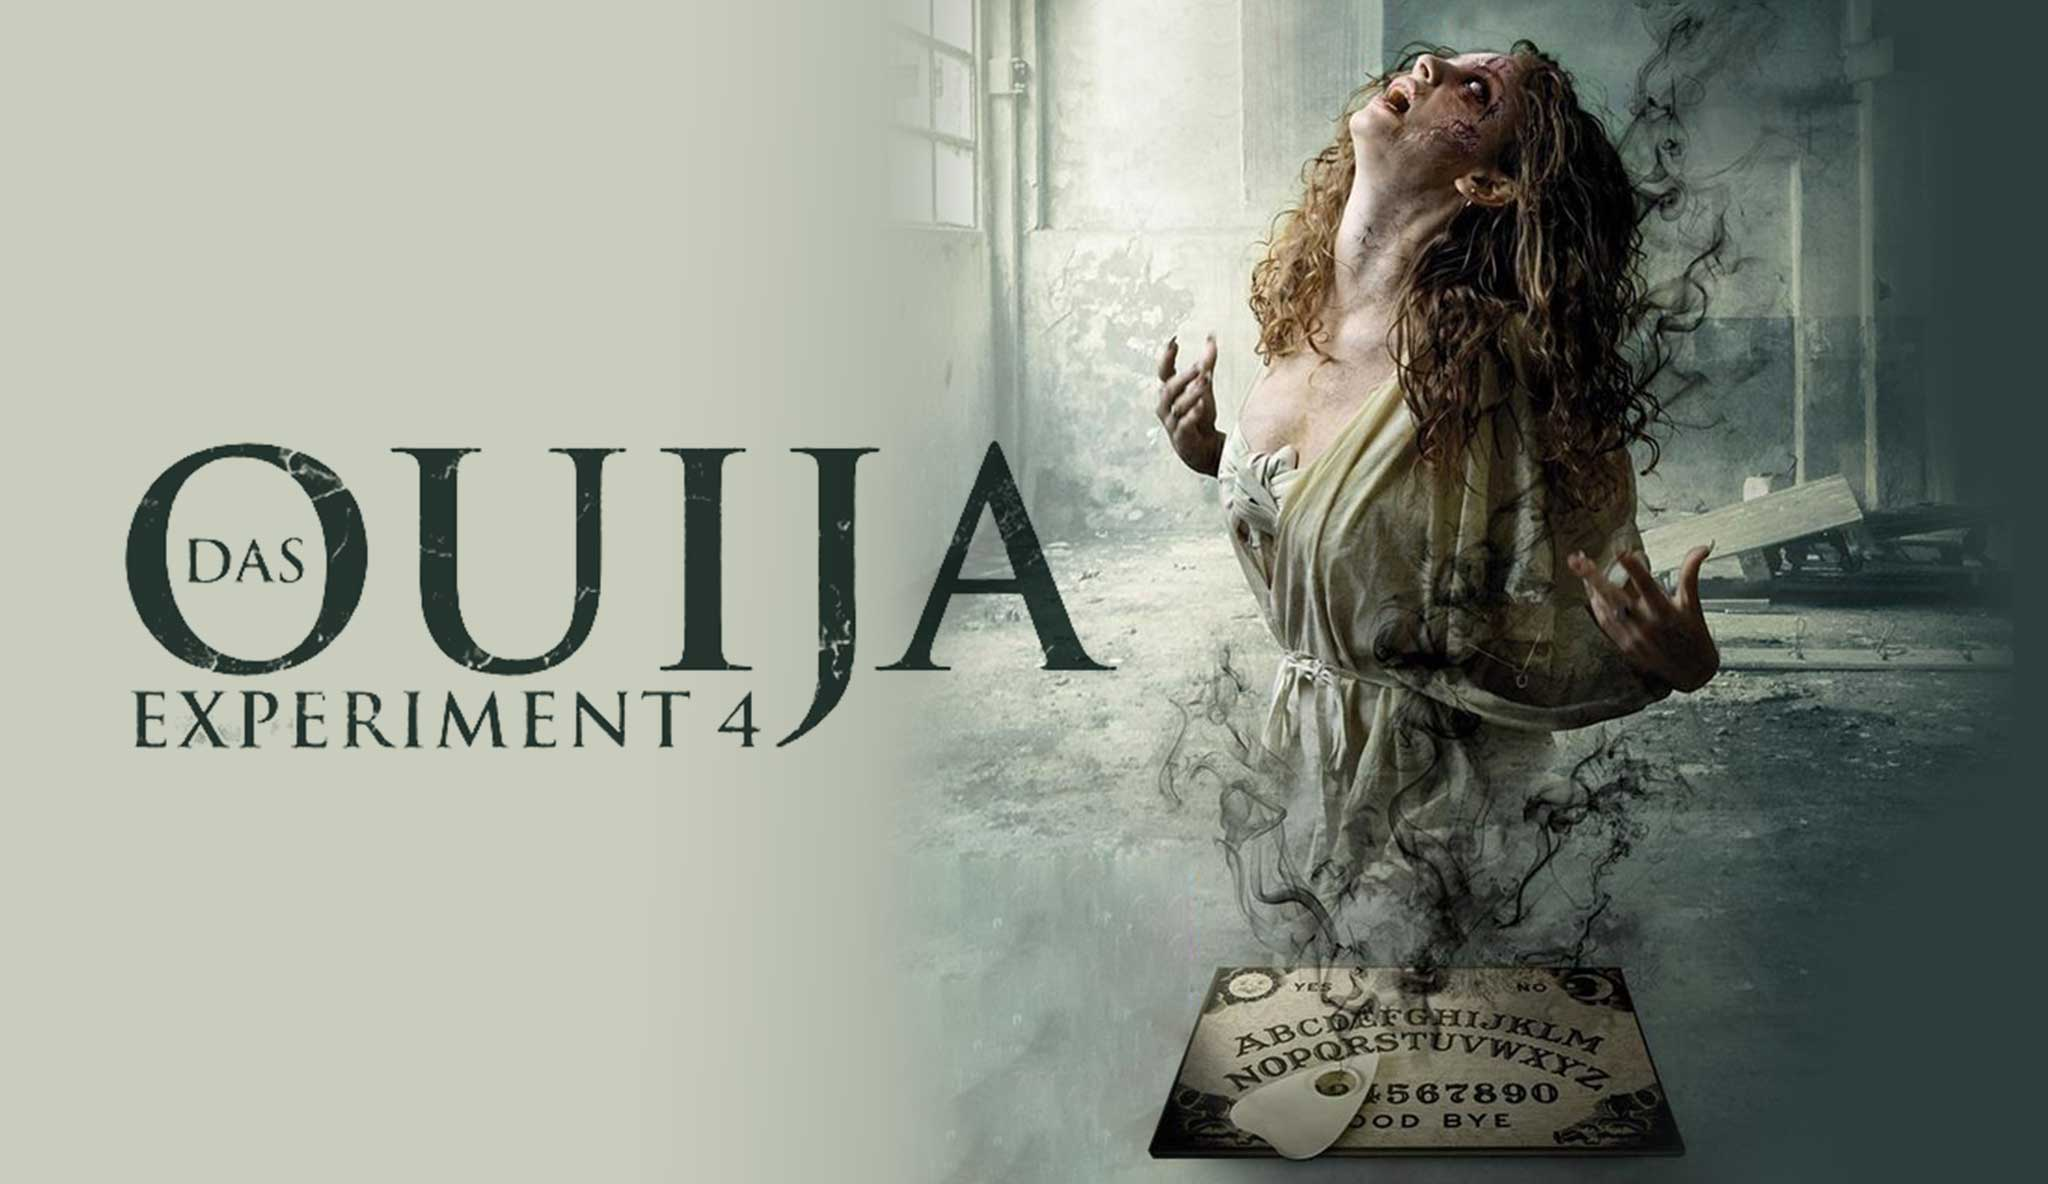 das-ouija-experiment-4-dead-in-the-woods\header.jpg